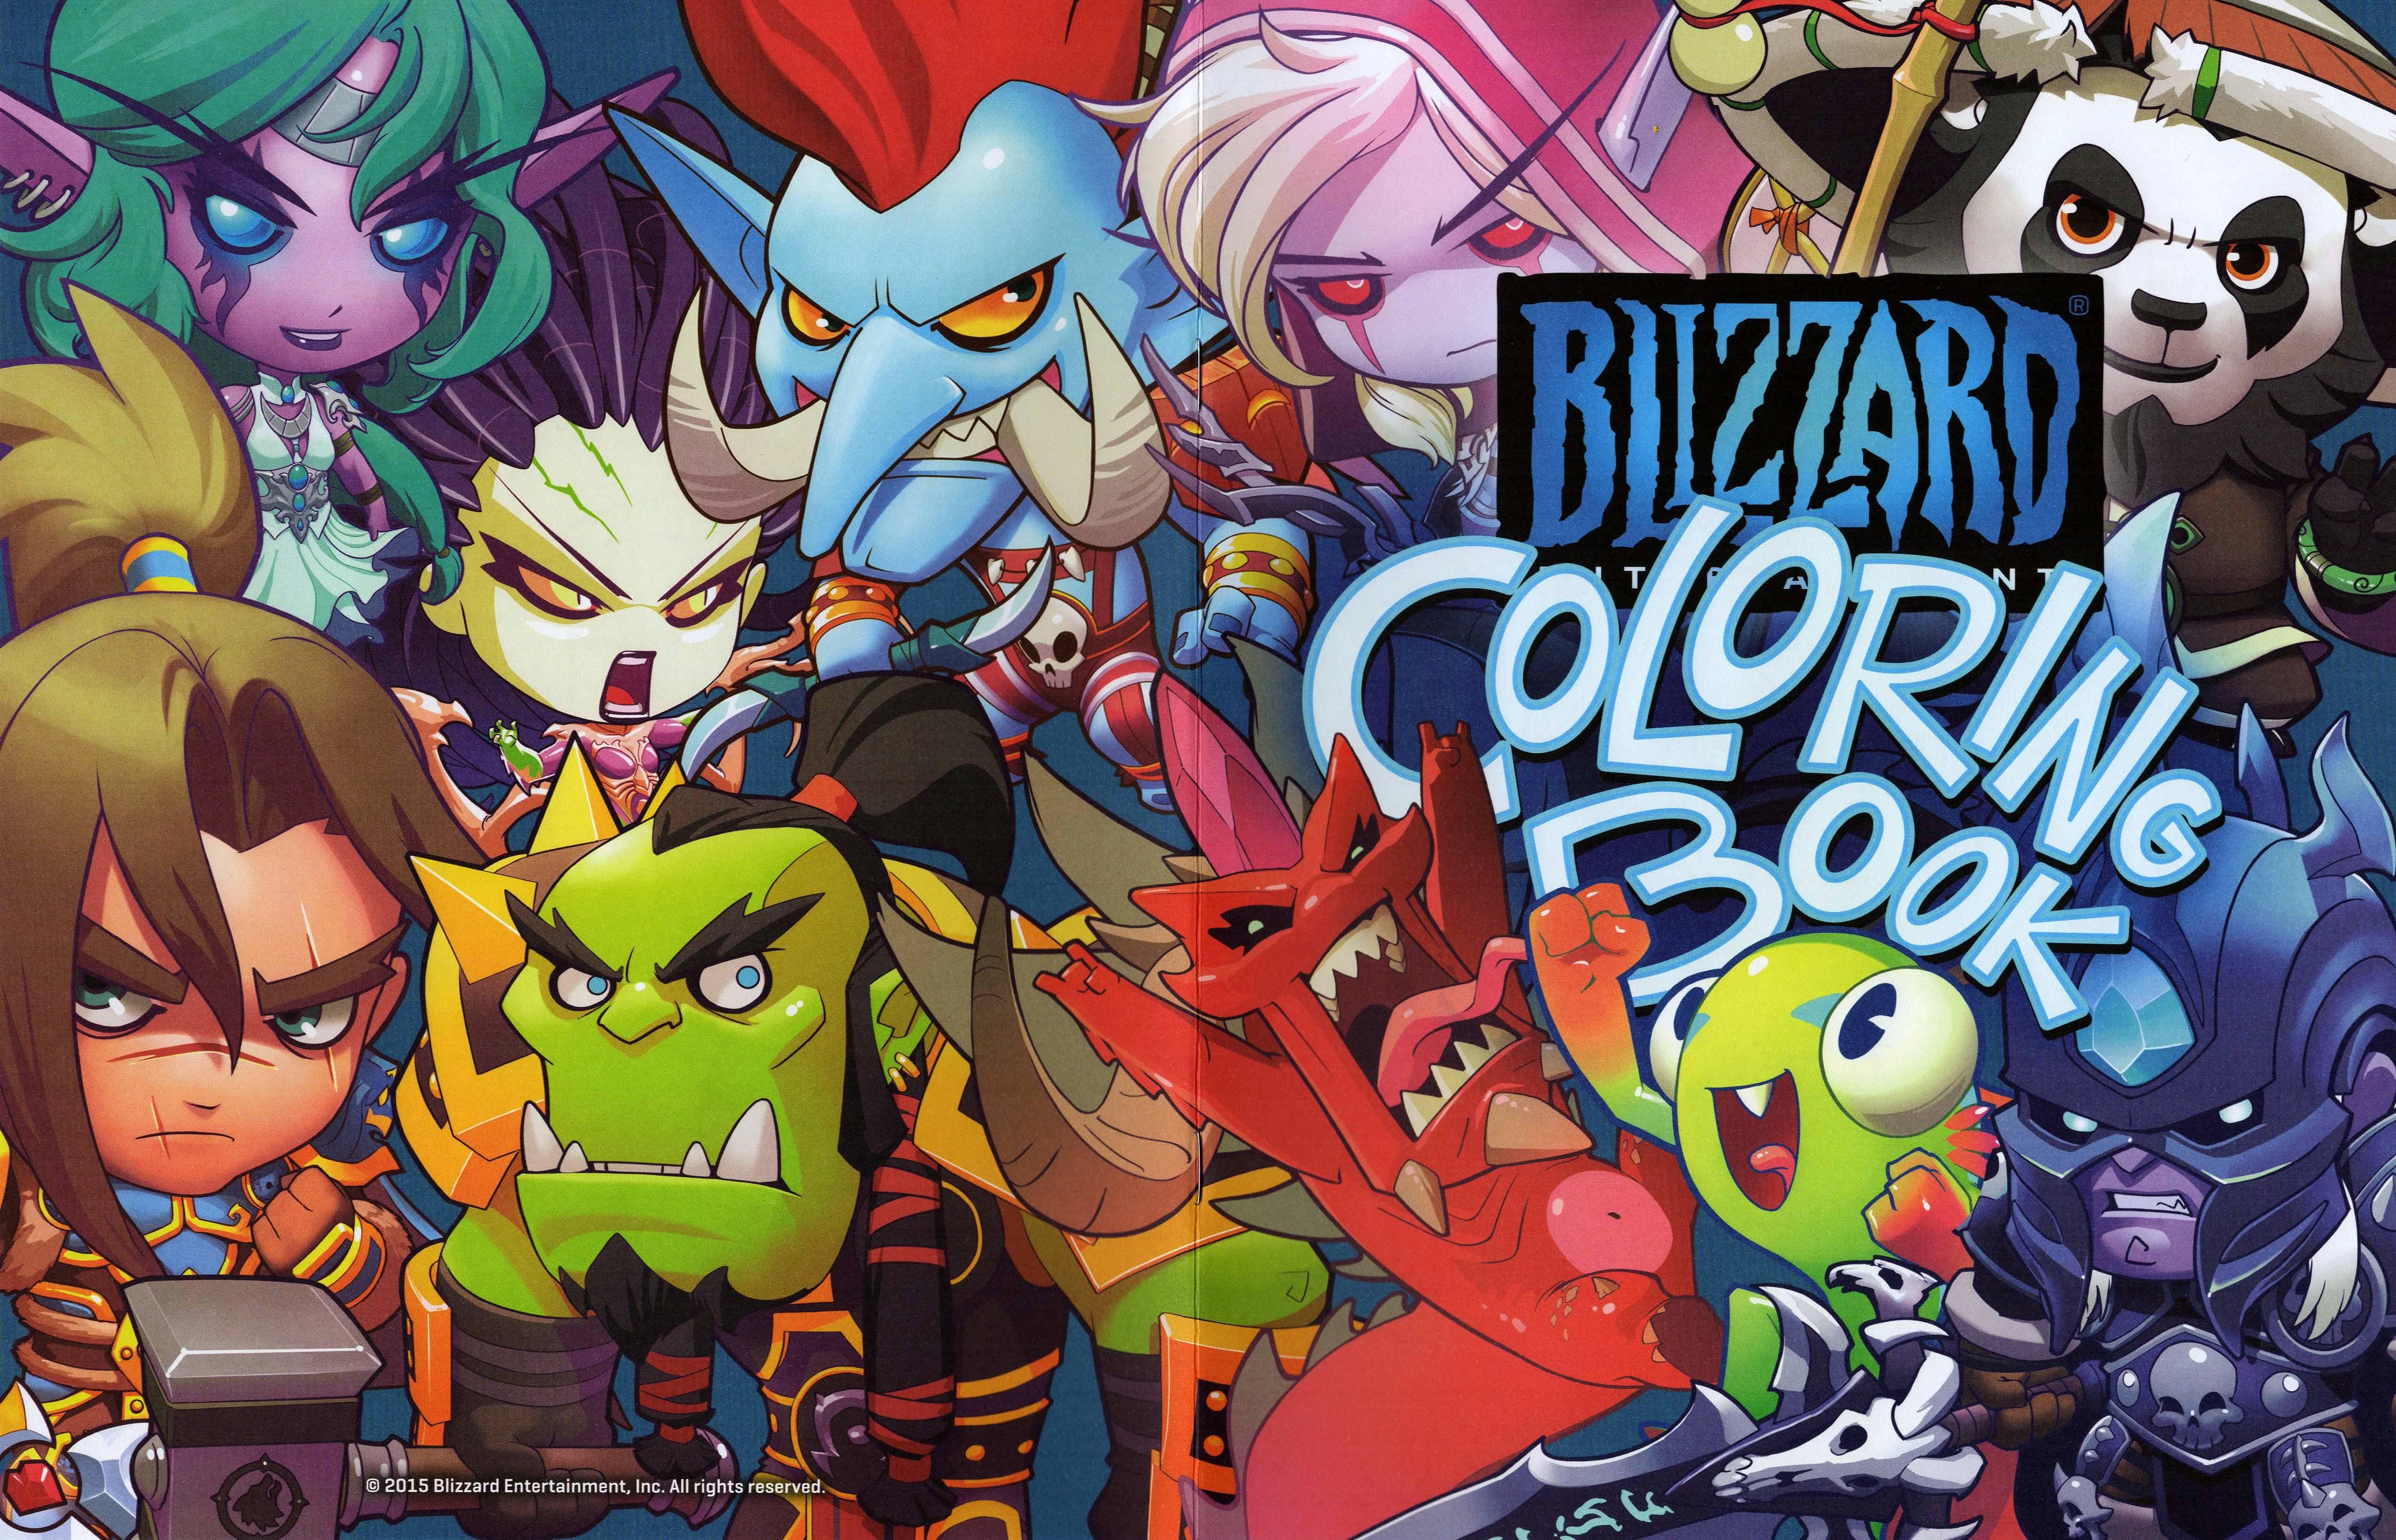 Blizzard Coloring Download Blizzard Coloring